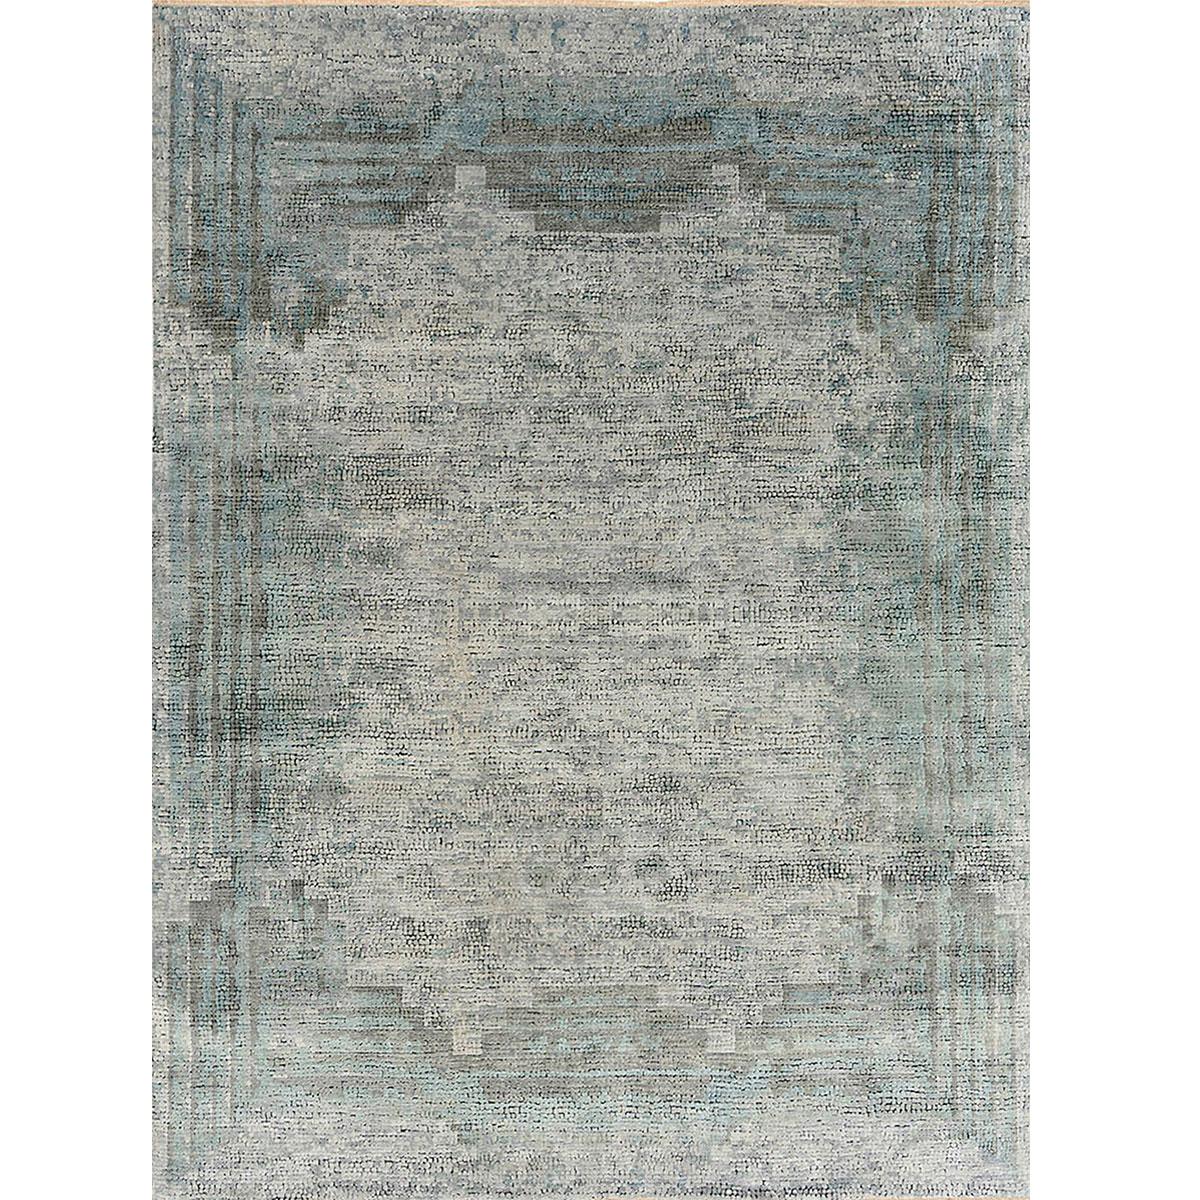 caractacus_wool-silk_hand-knotted_patterson-flynn-martin_pfm